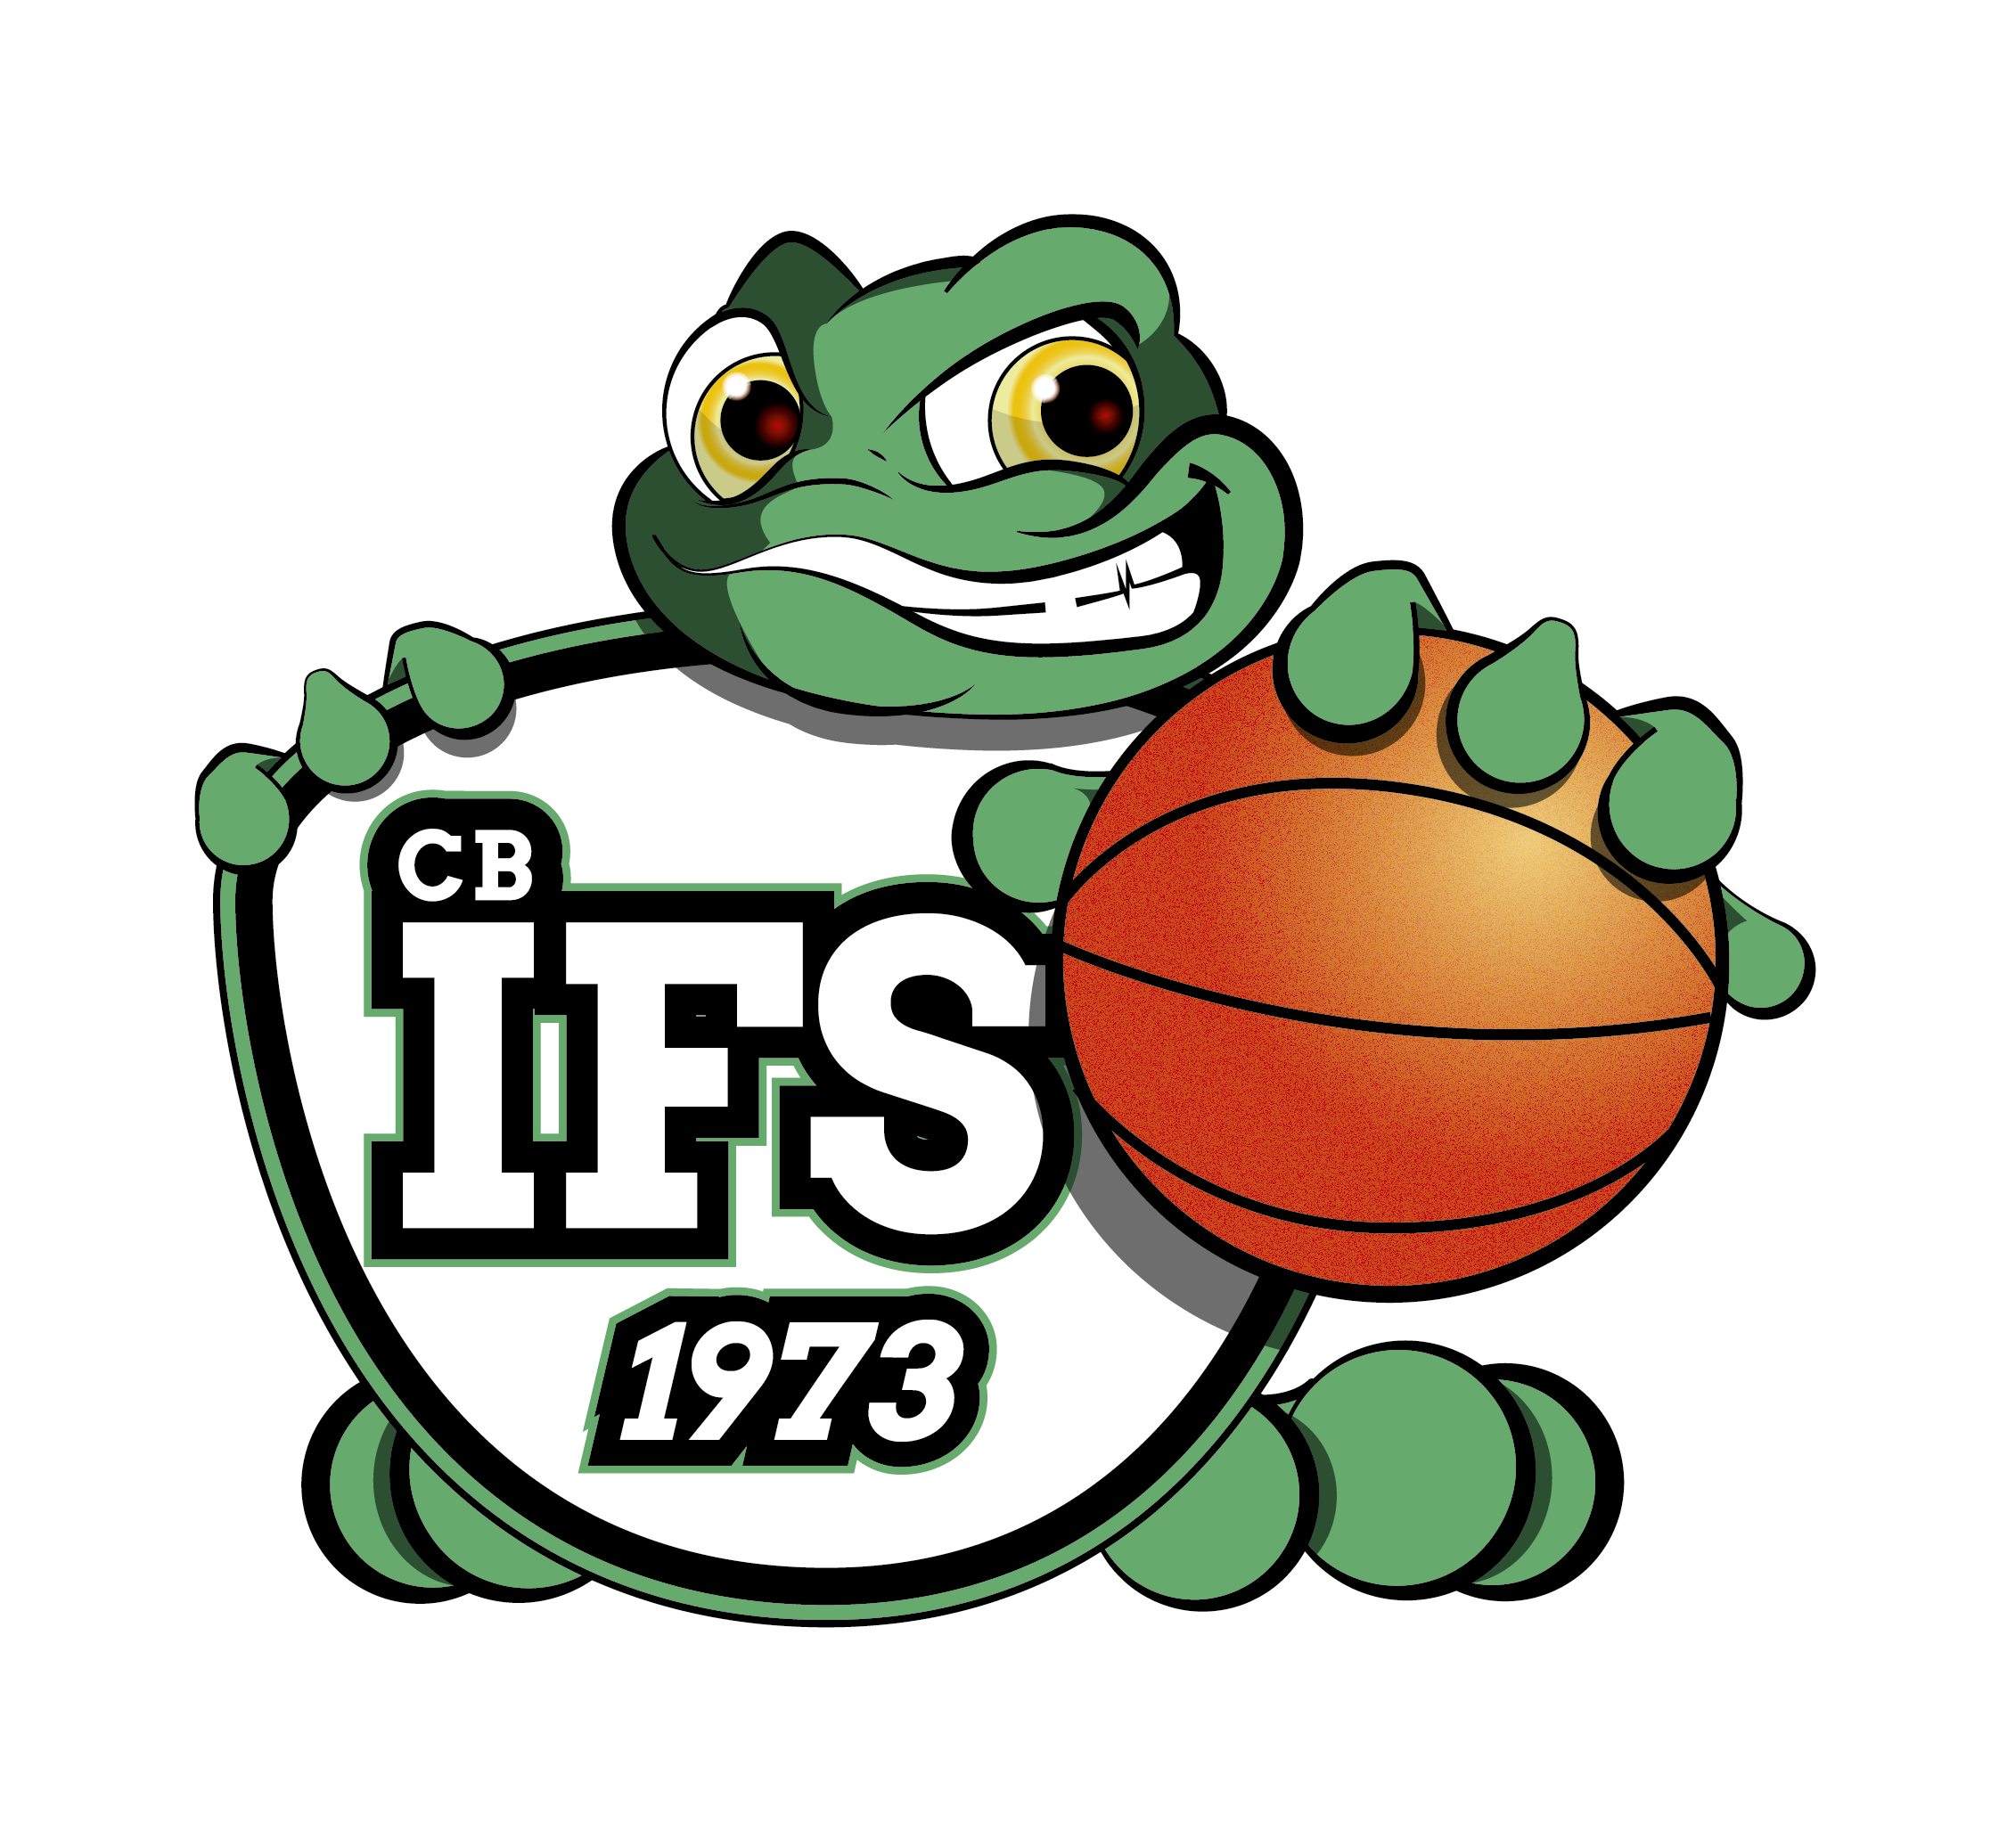 Club de basket d'ifs